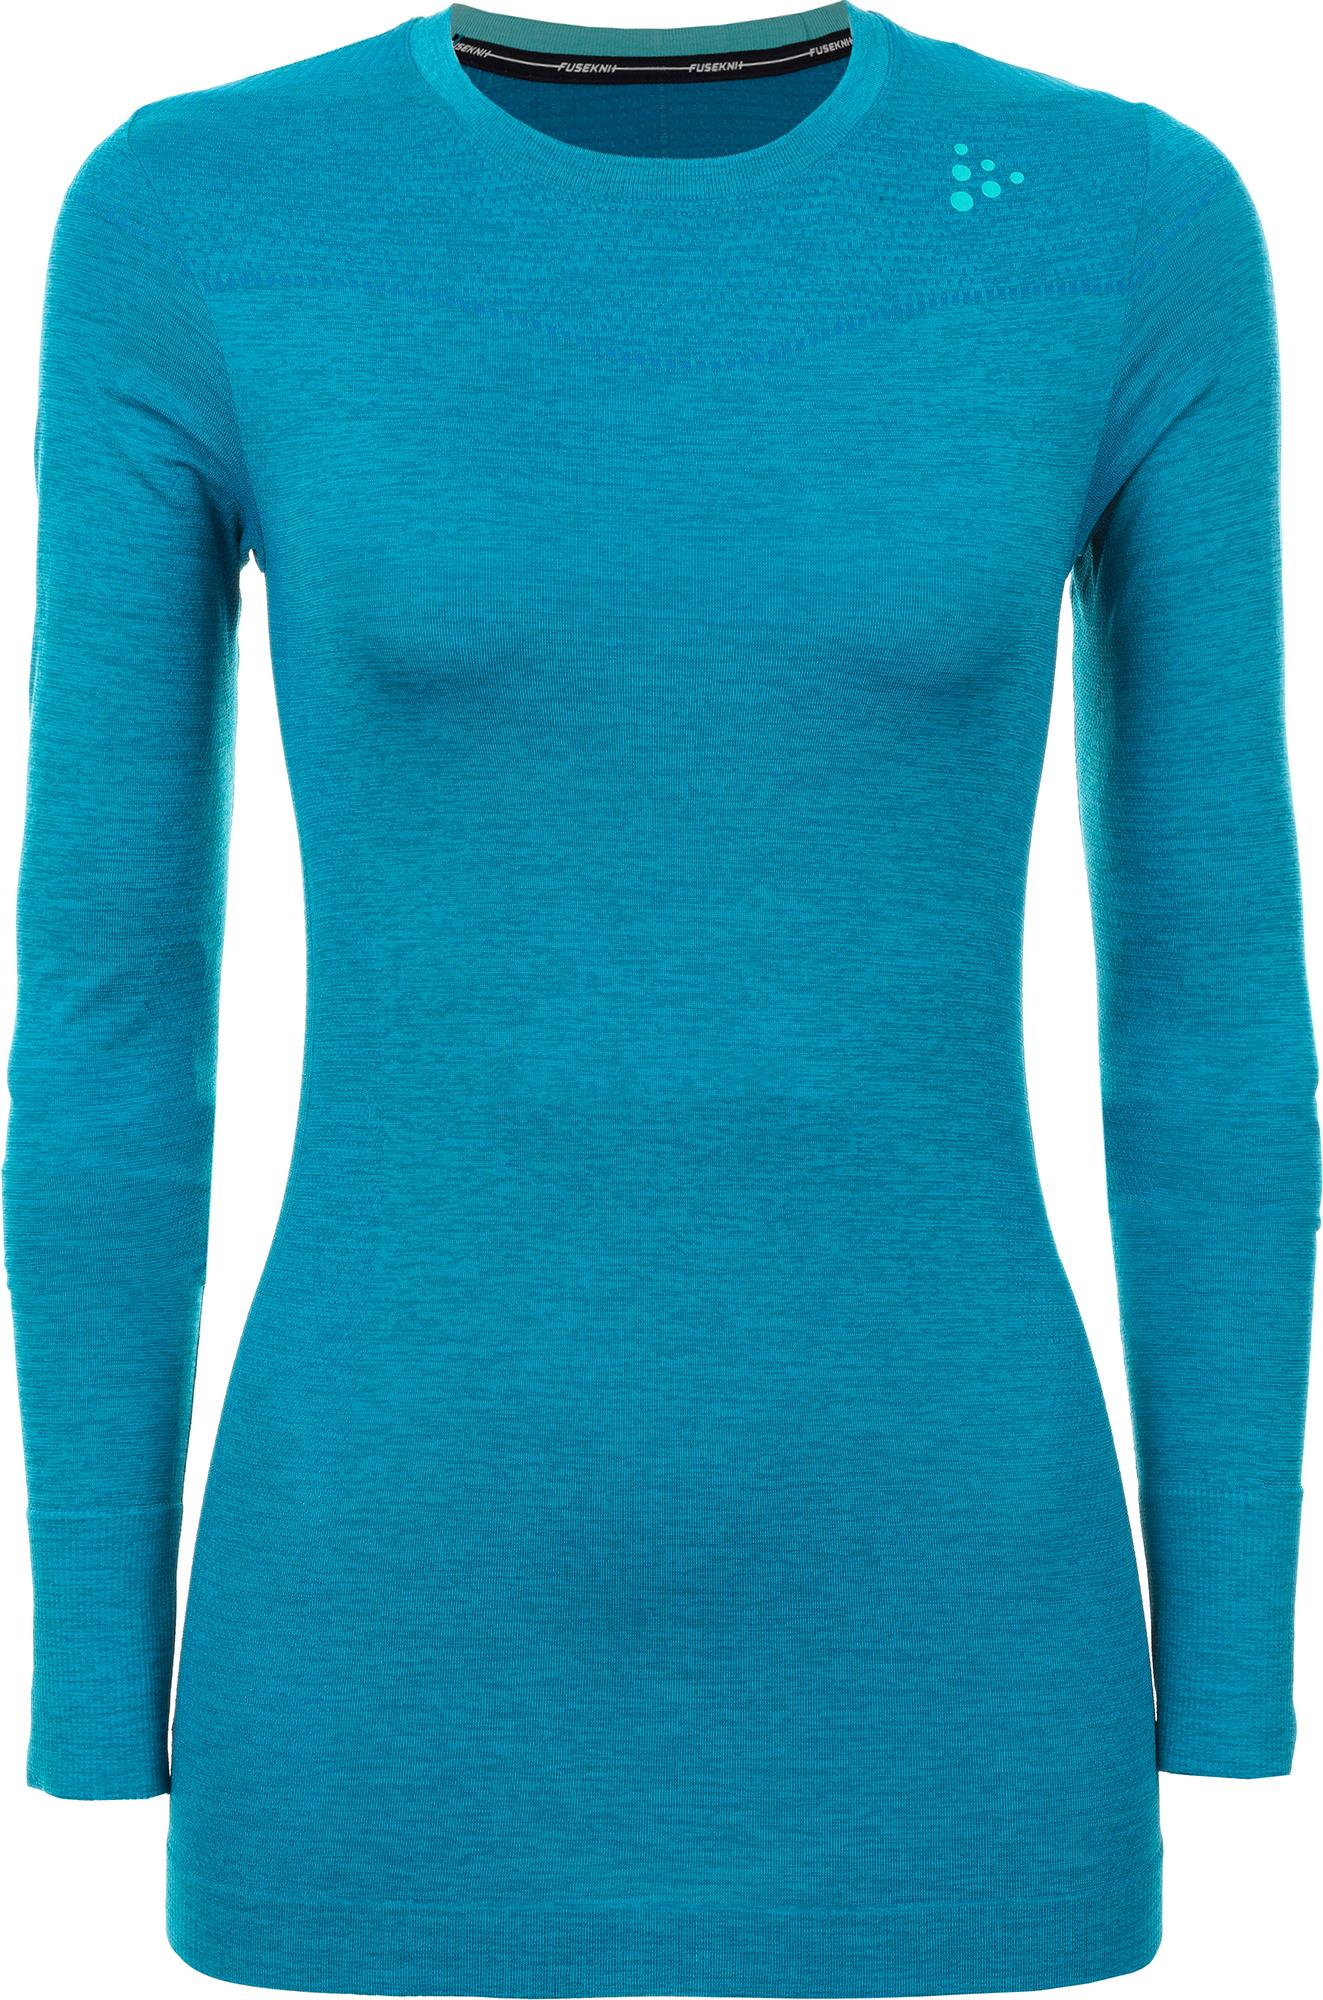 Craft Фуфайка женская Craft Fuseknit Comfort, размер 48-50 цены онлайн